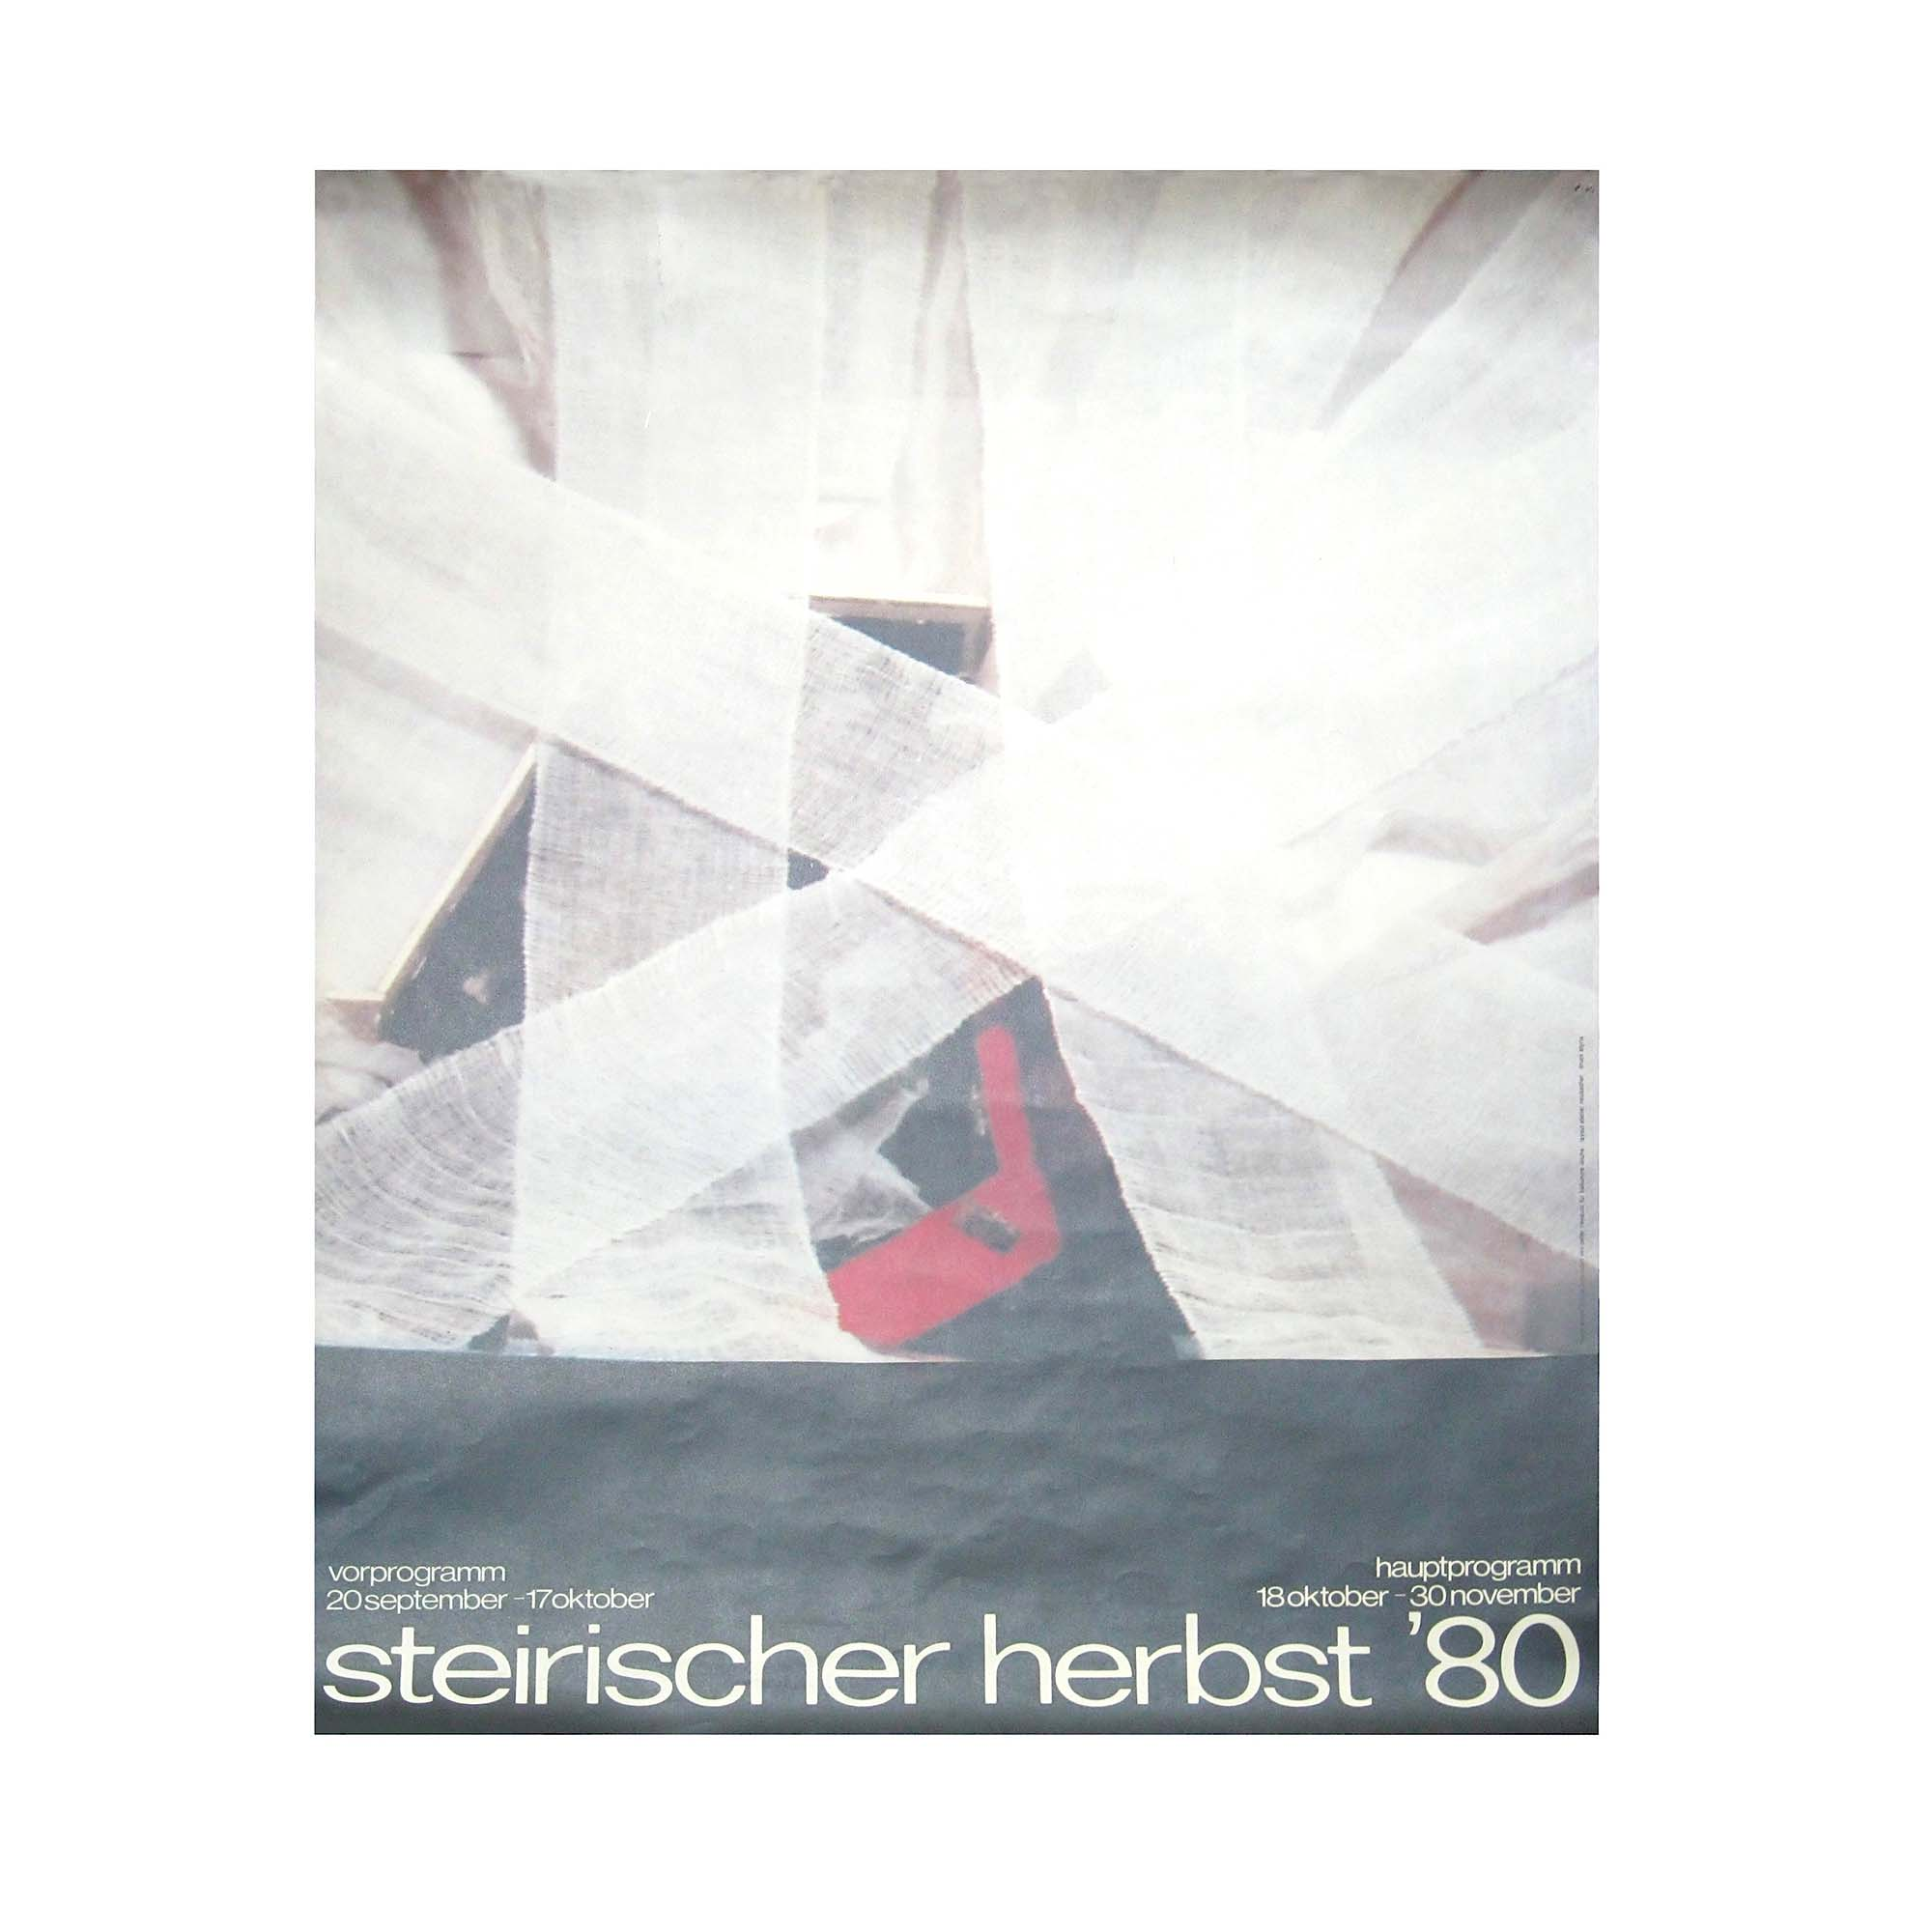 8049-Plakat-Steirischer-Herbst-1980-N.jpg